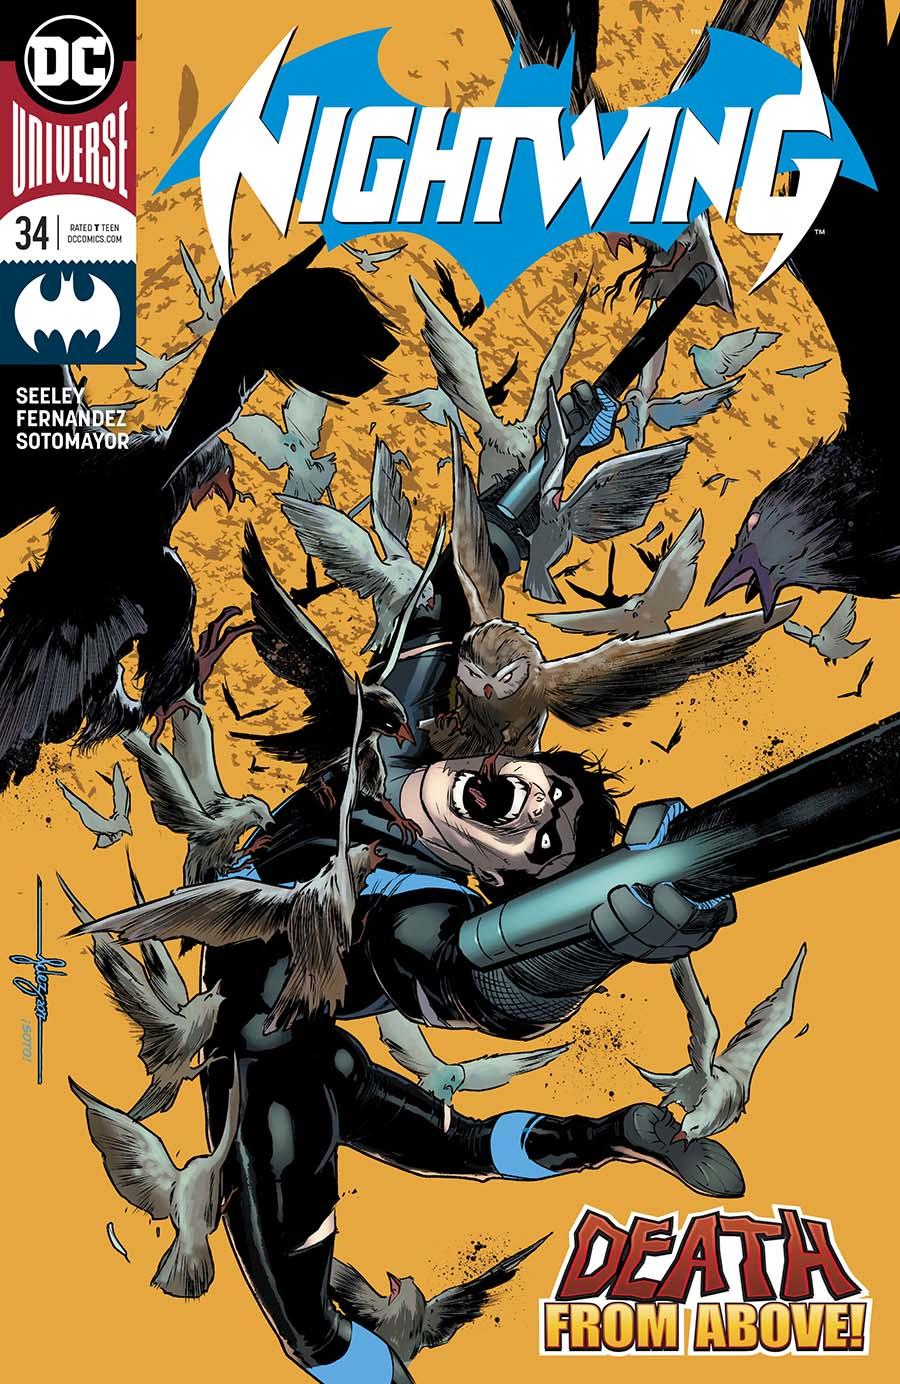 Nightwing Vol 4 #34 Cover A Regular Javier Fernandez Cover